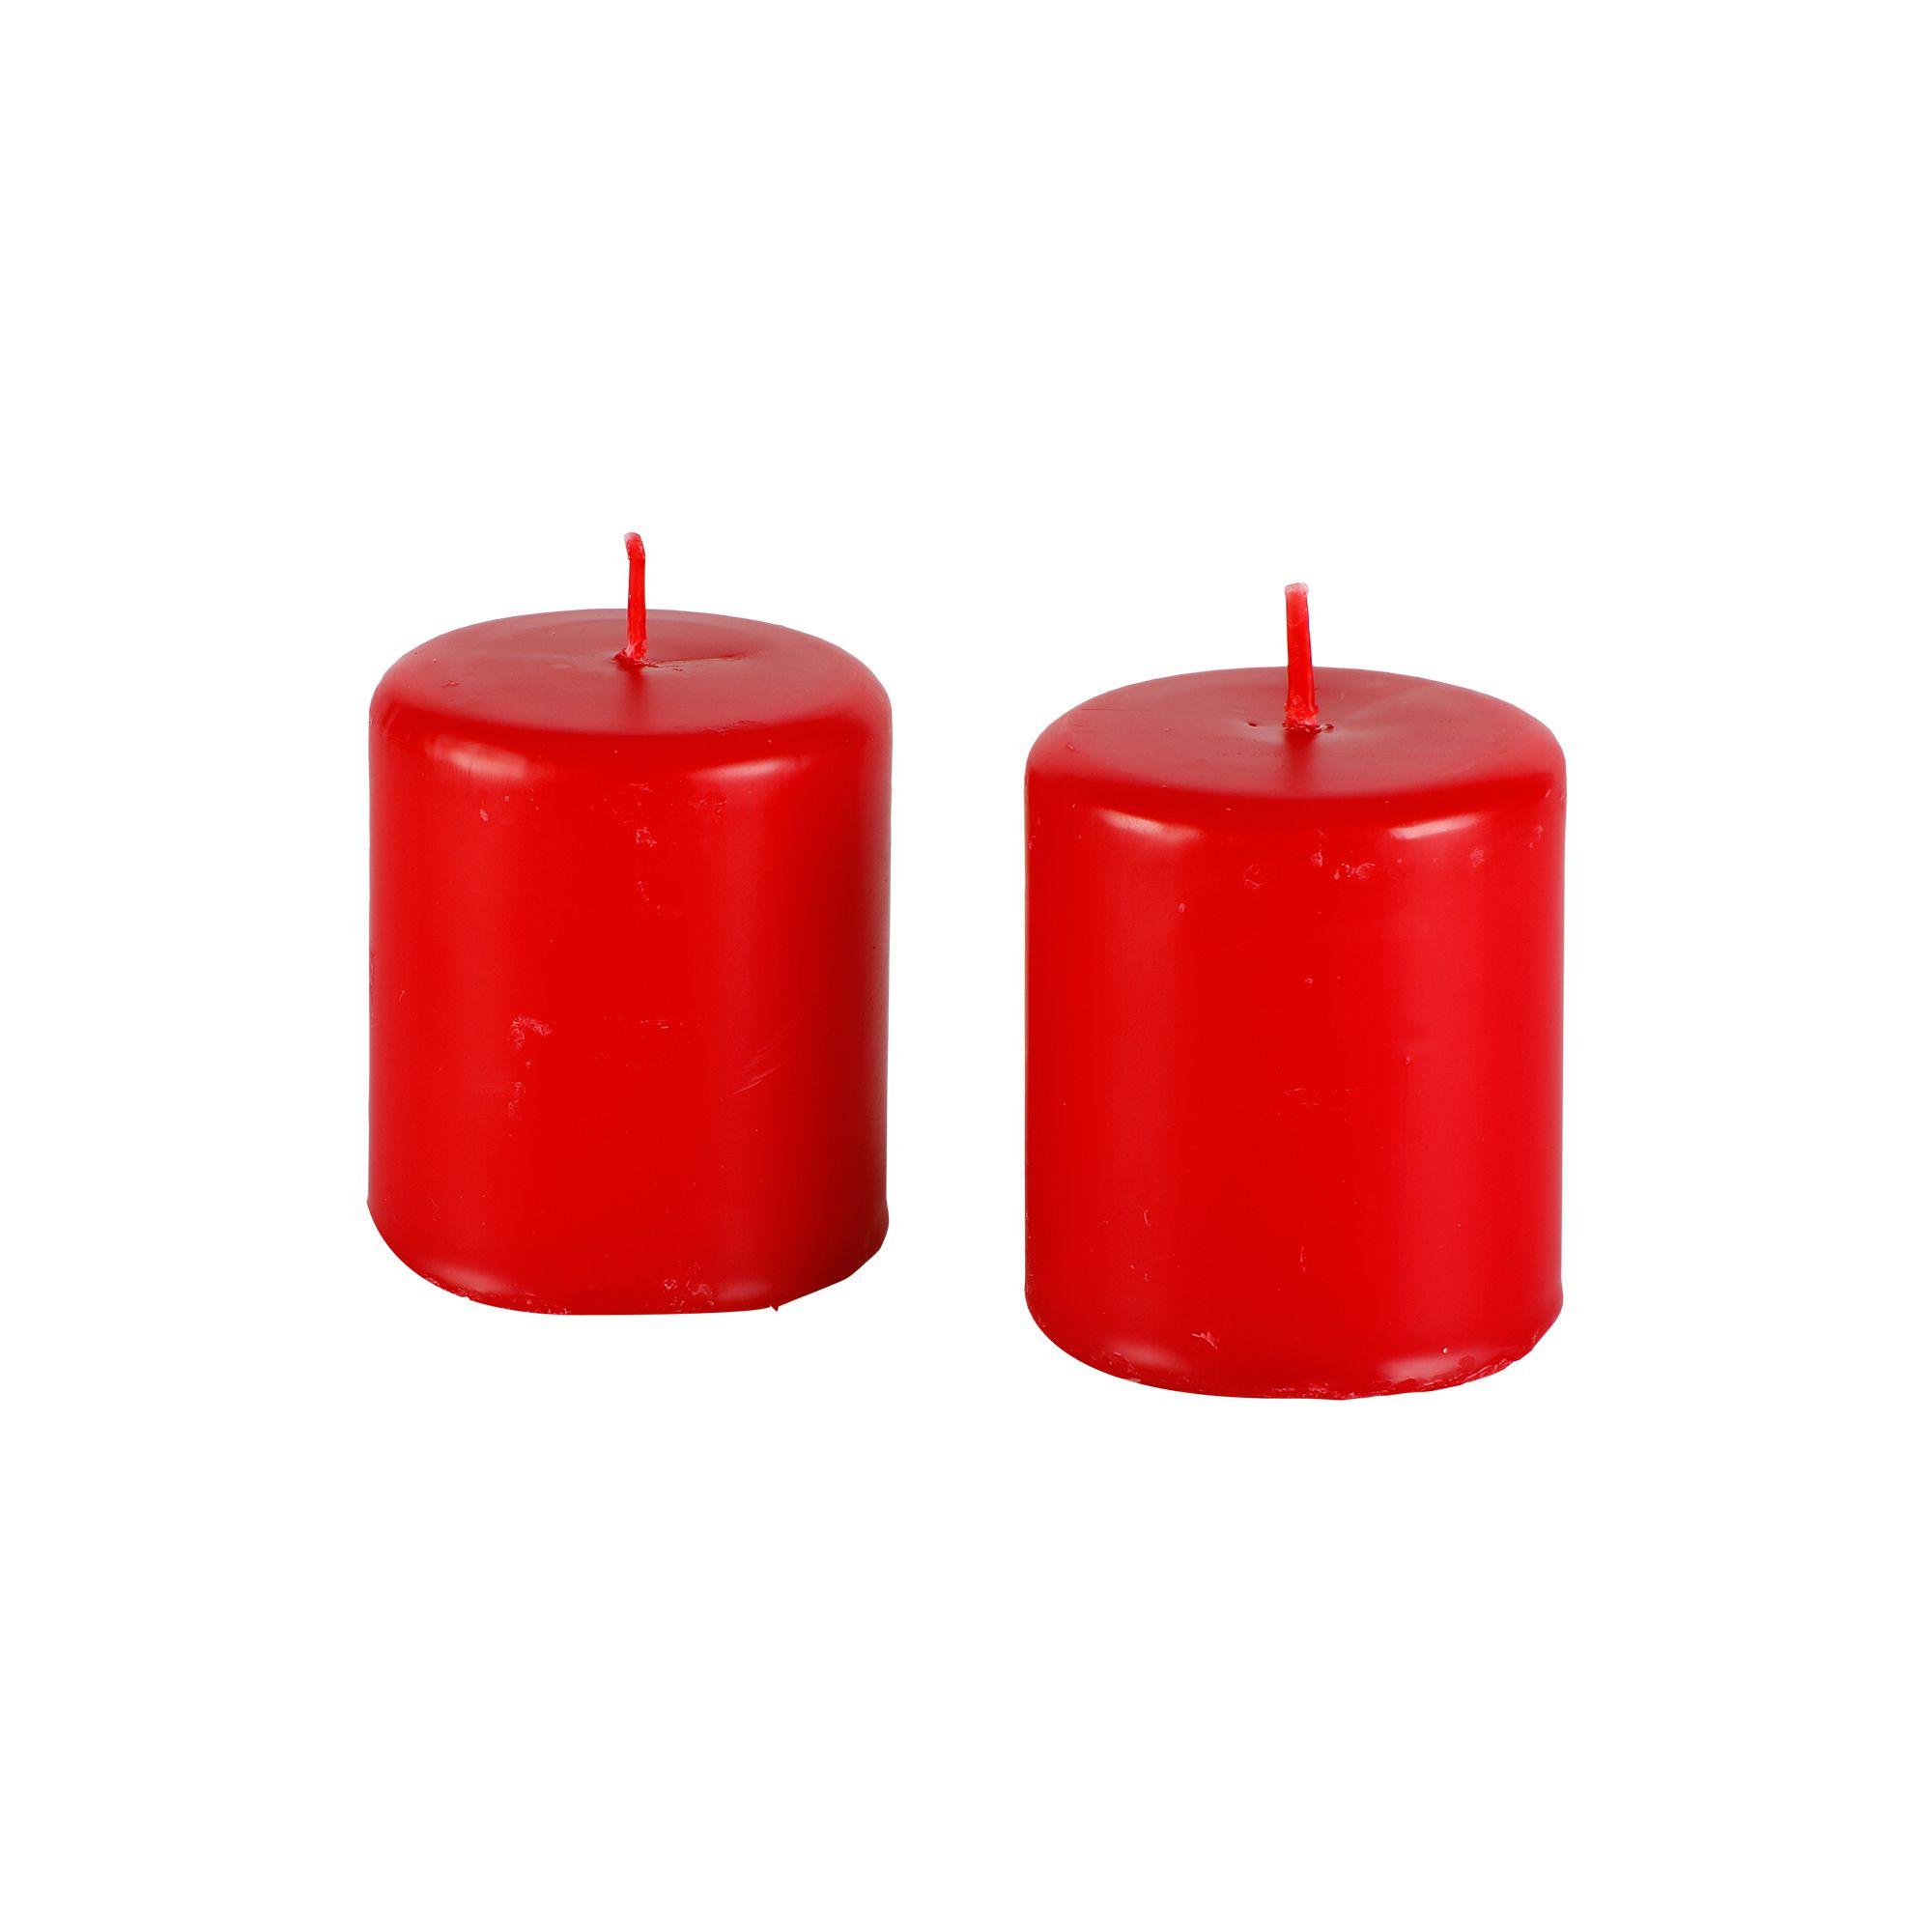 Par de velas cilíndricas  6 cm x 7 cm